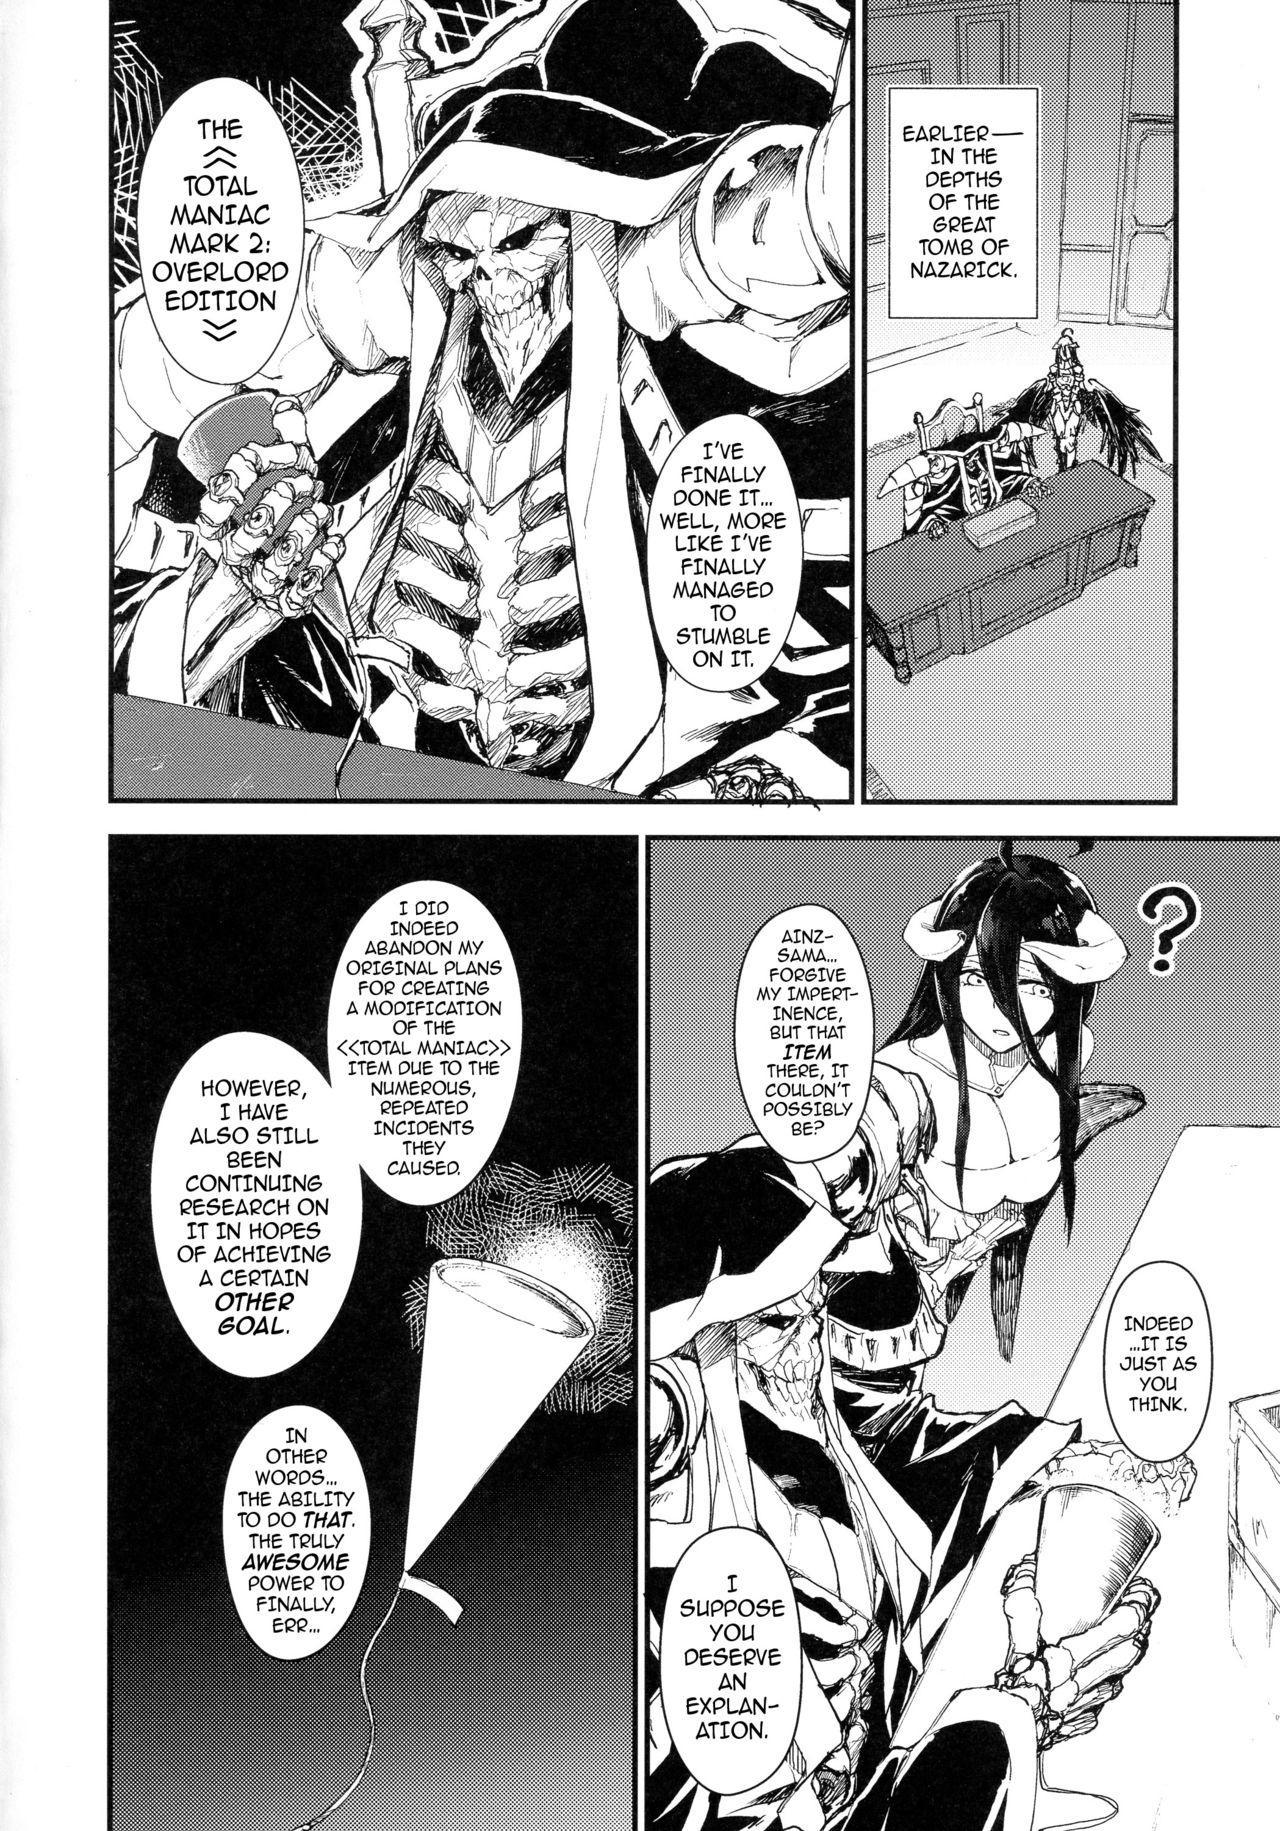 (COMIC1☆13) [Sekigaiken (Komagata)] Ainz-sama no Oyotsugi o! | Ainz-sama, Leave Your Heir to! (Overlord) [English] {darknight} 2